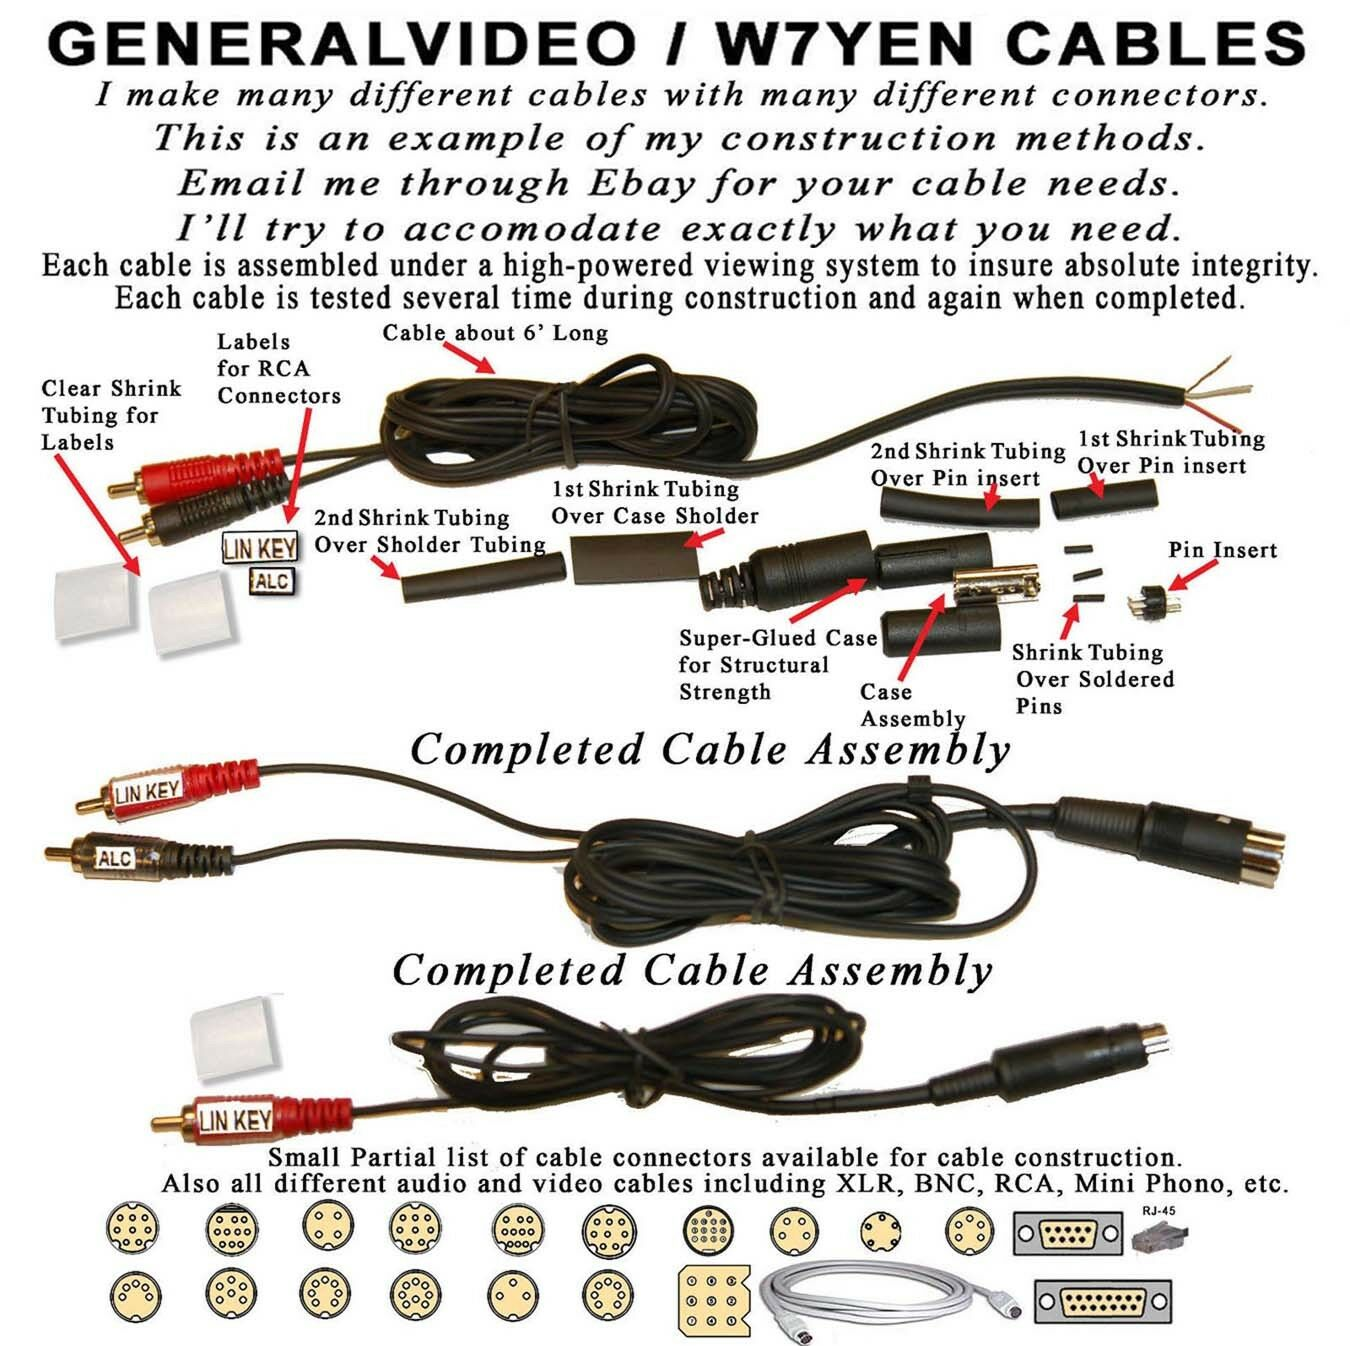 Wire Diagram For Yaesu 6 Pin Plug And Psk31 43 Wiring Pinout Din 57set Id8800005007 Ft 847 Radio Communication Ebay At